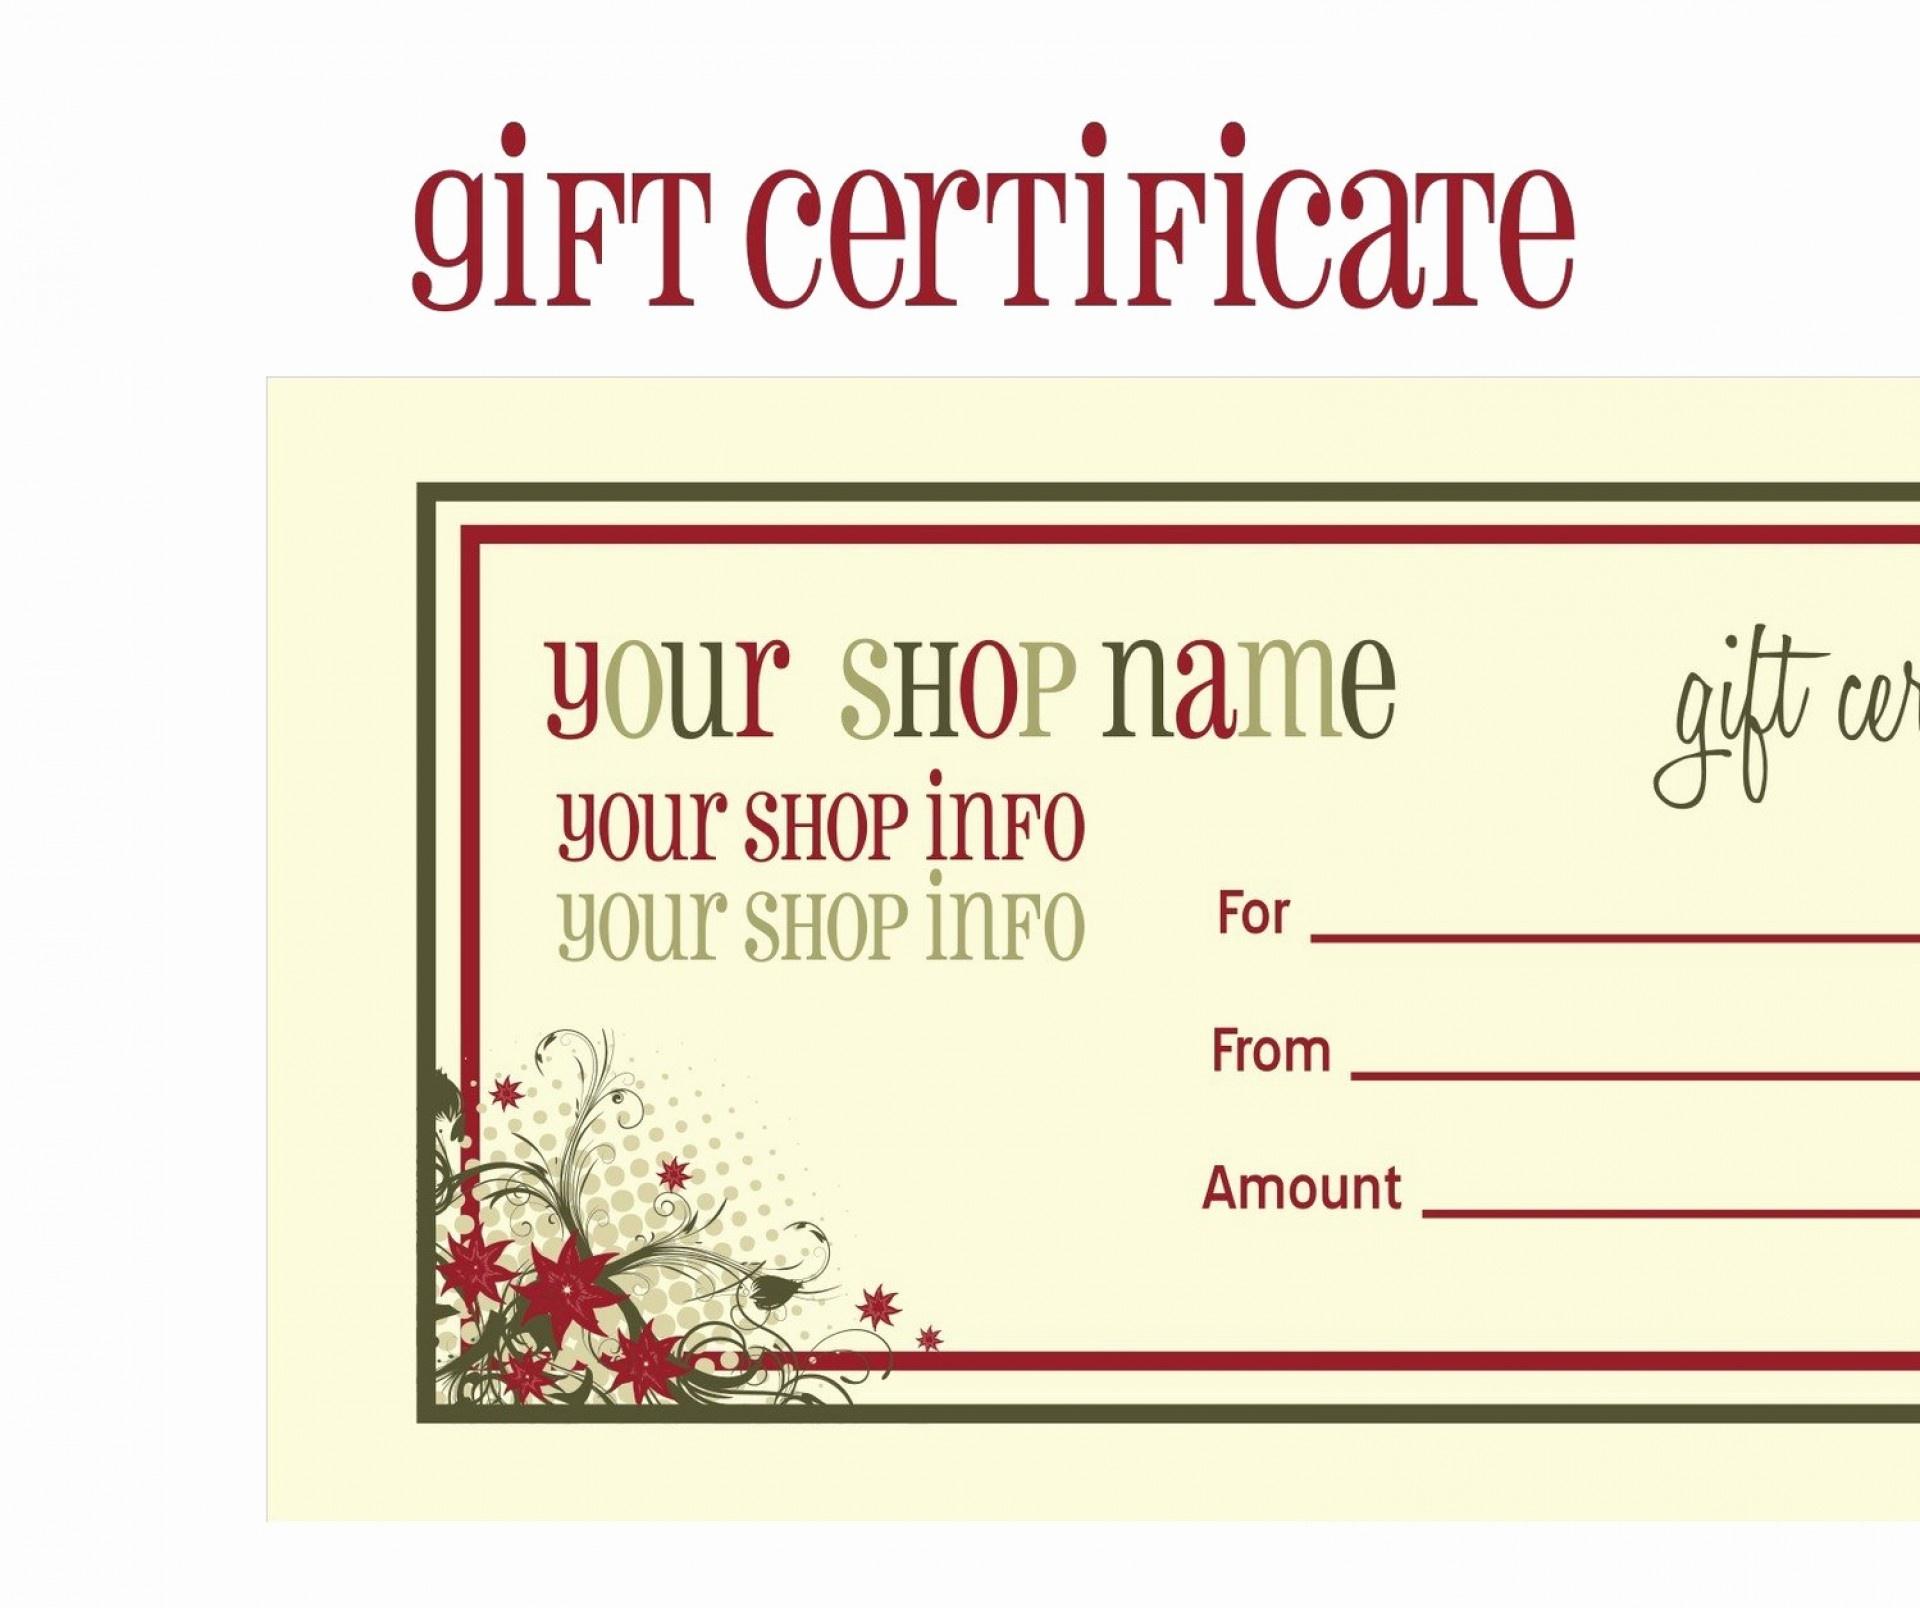 009 Printable Gift Certificatess Free Pics 948X1227 Certificate - Free Printable Gift Vouchers Uk